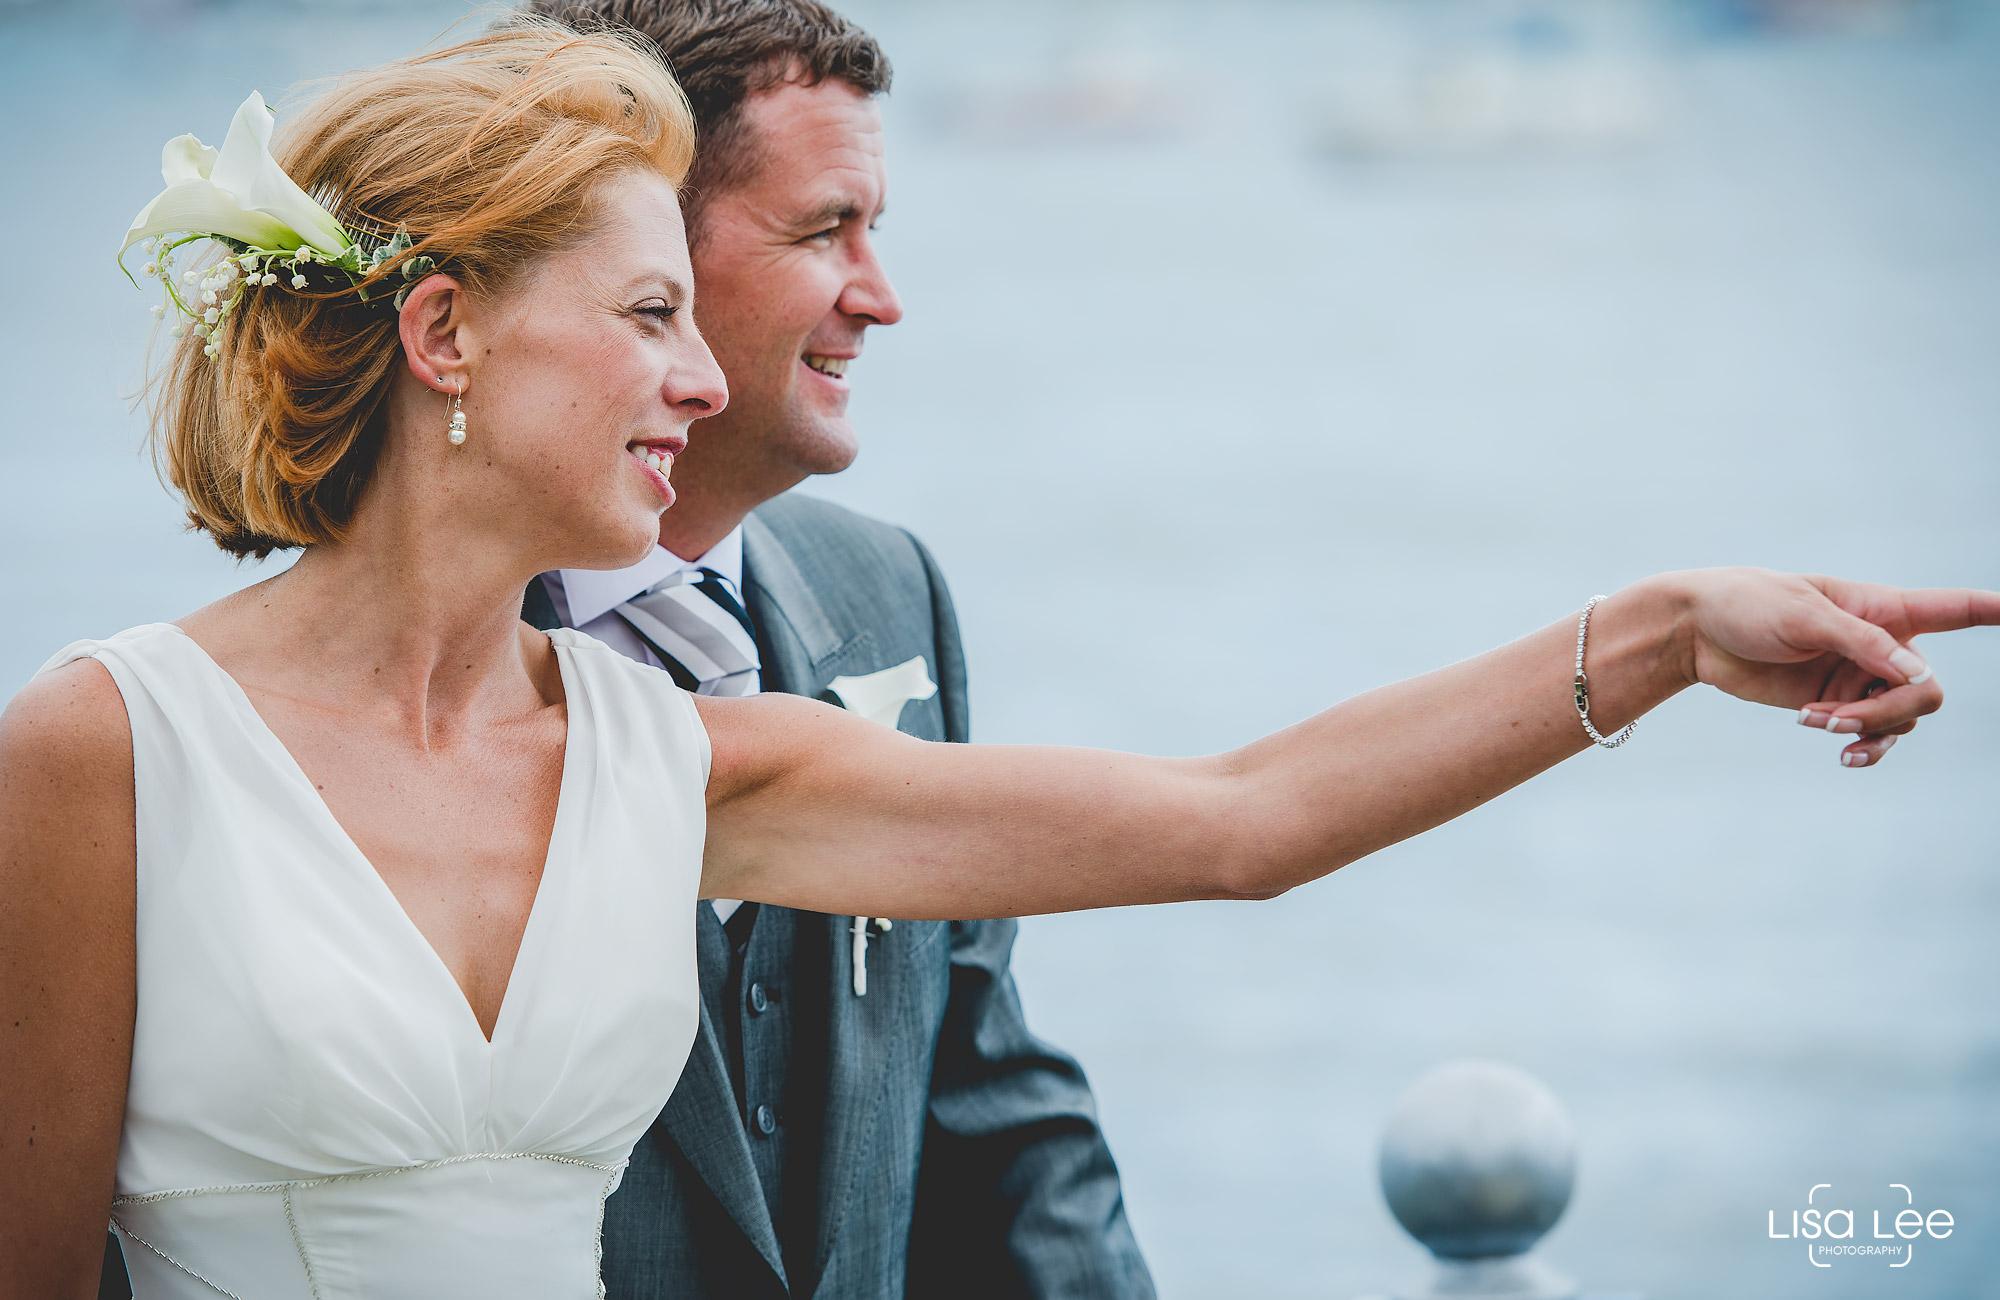 lisa-lee-wedding-photography-christchurch-dorset-bridegroom2.jpg